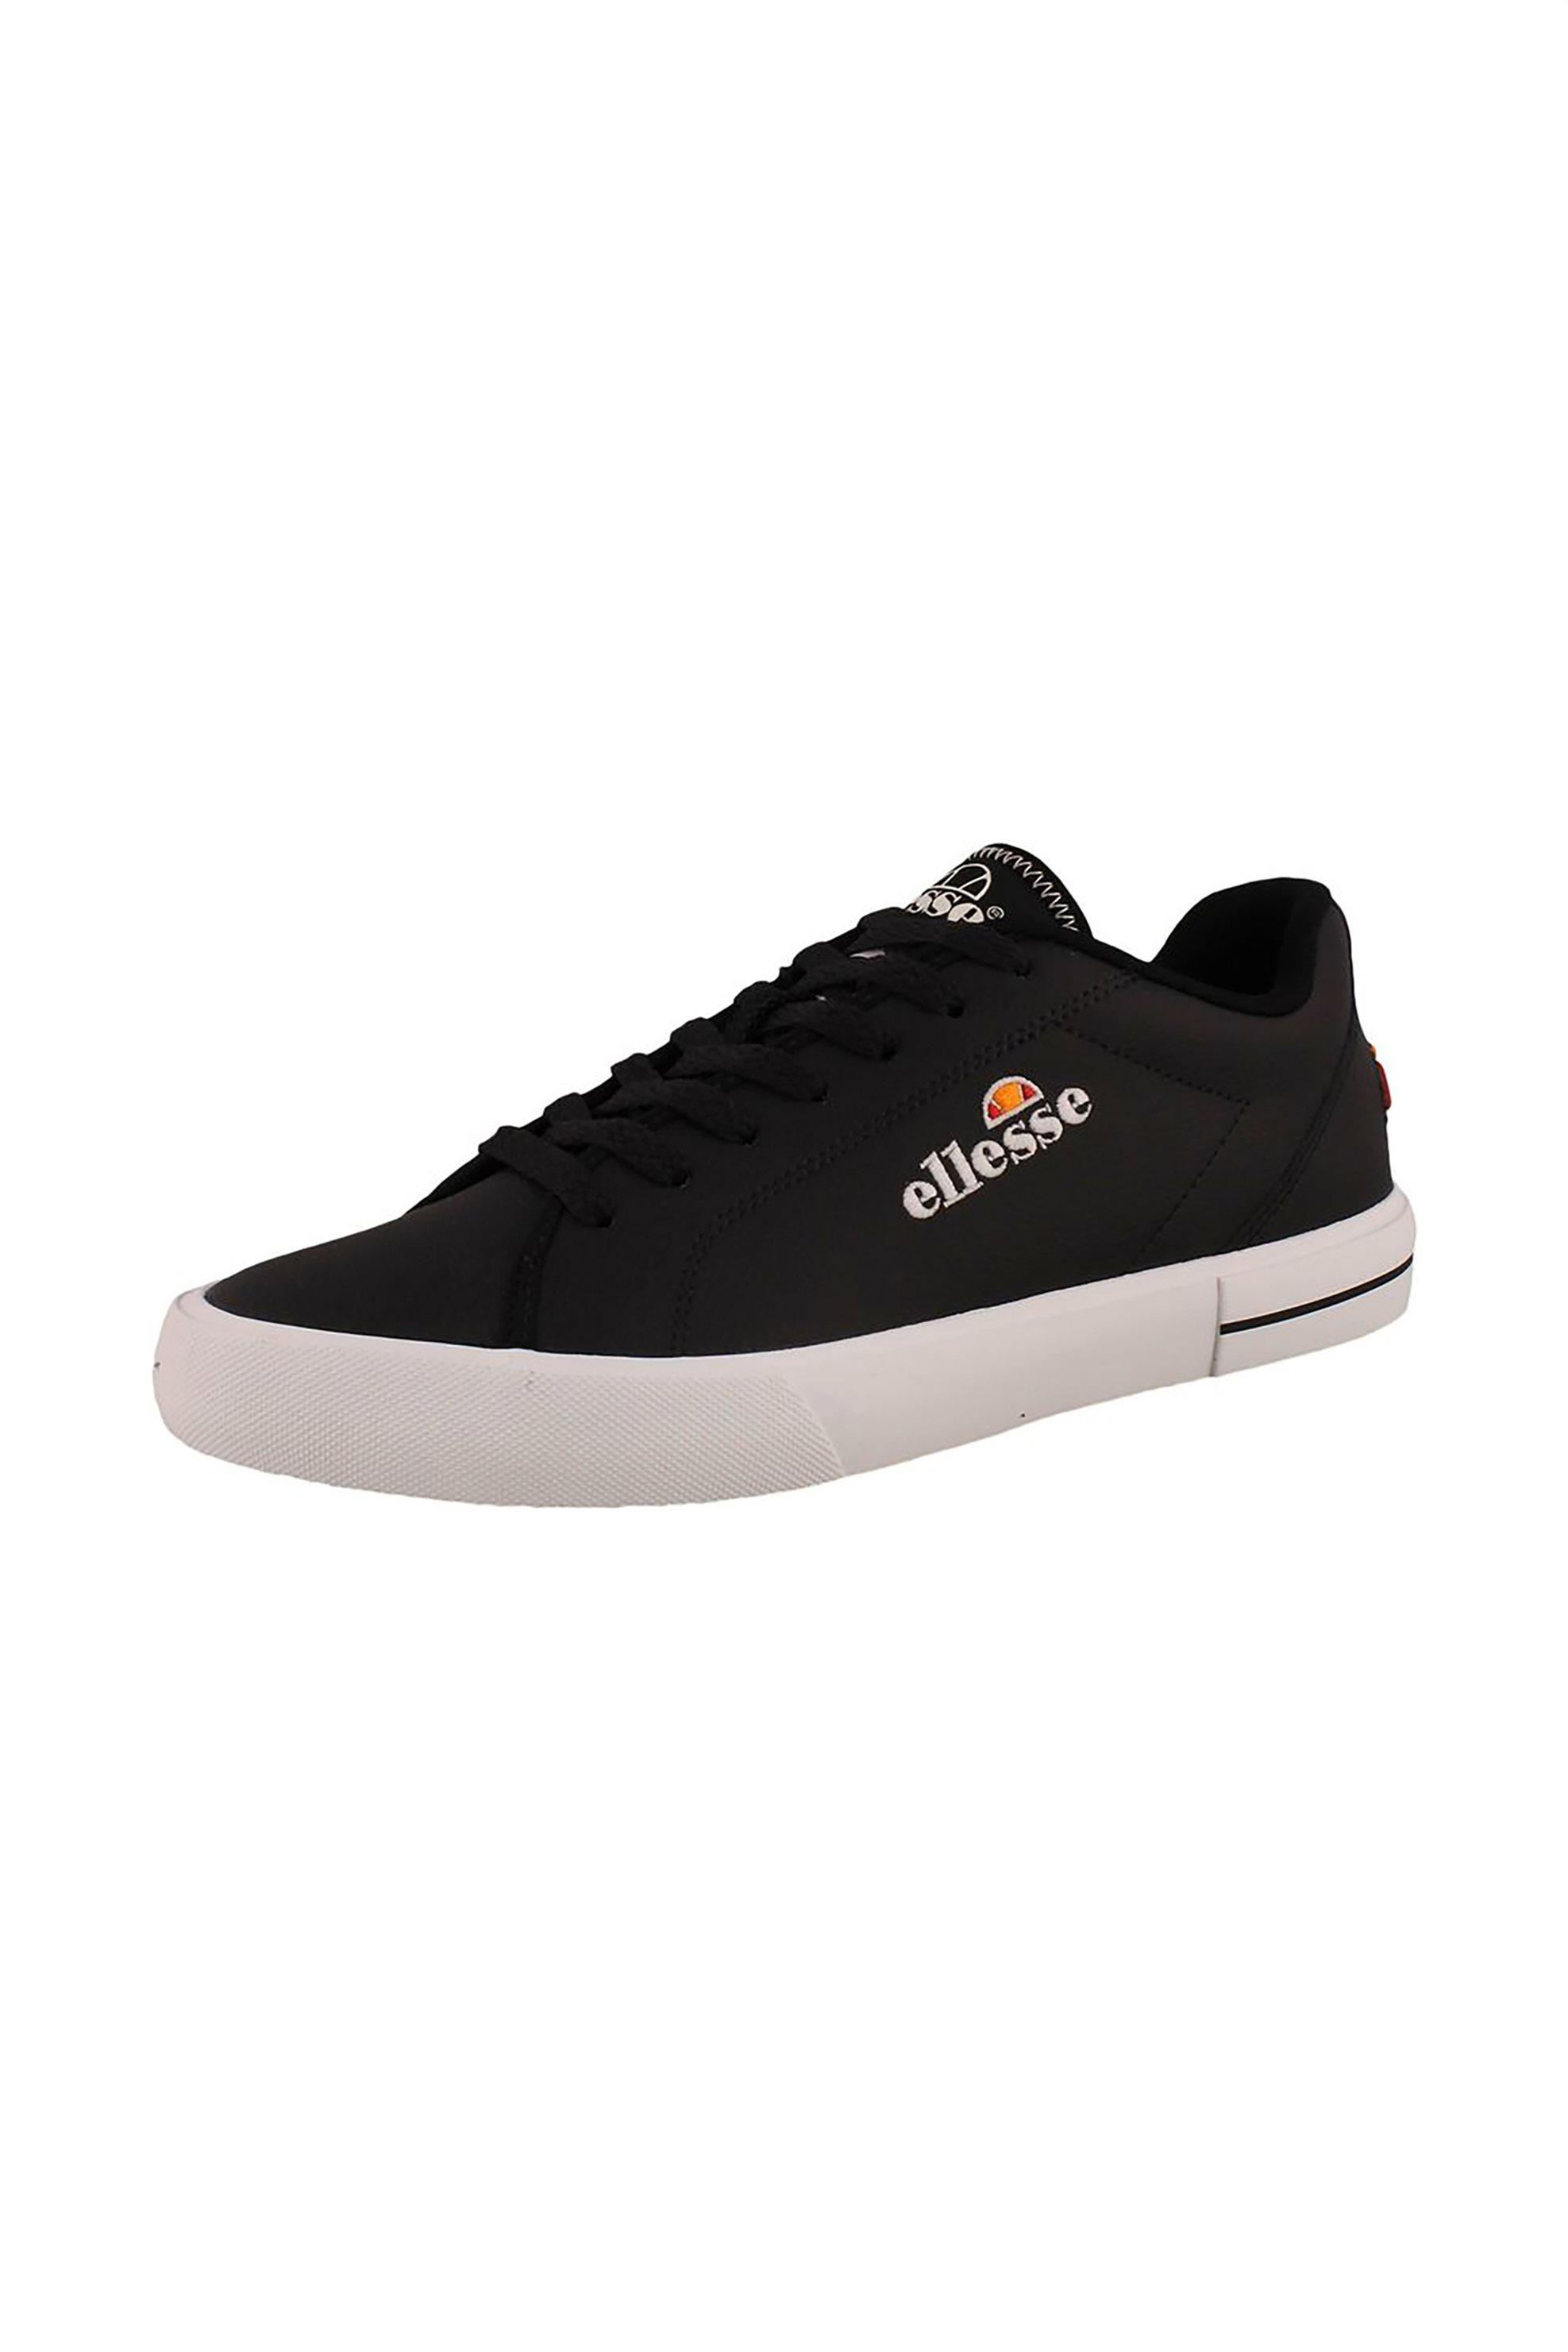 "Ellesse ανδρικά sneakers με κορδόνια ""Taggia"" – 613660 – Μαύρο"